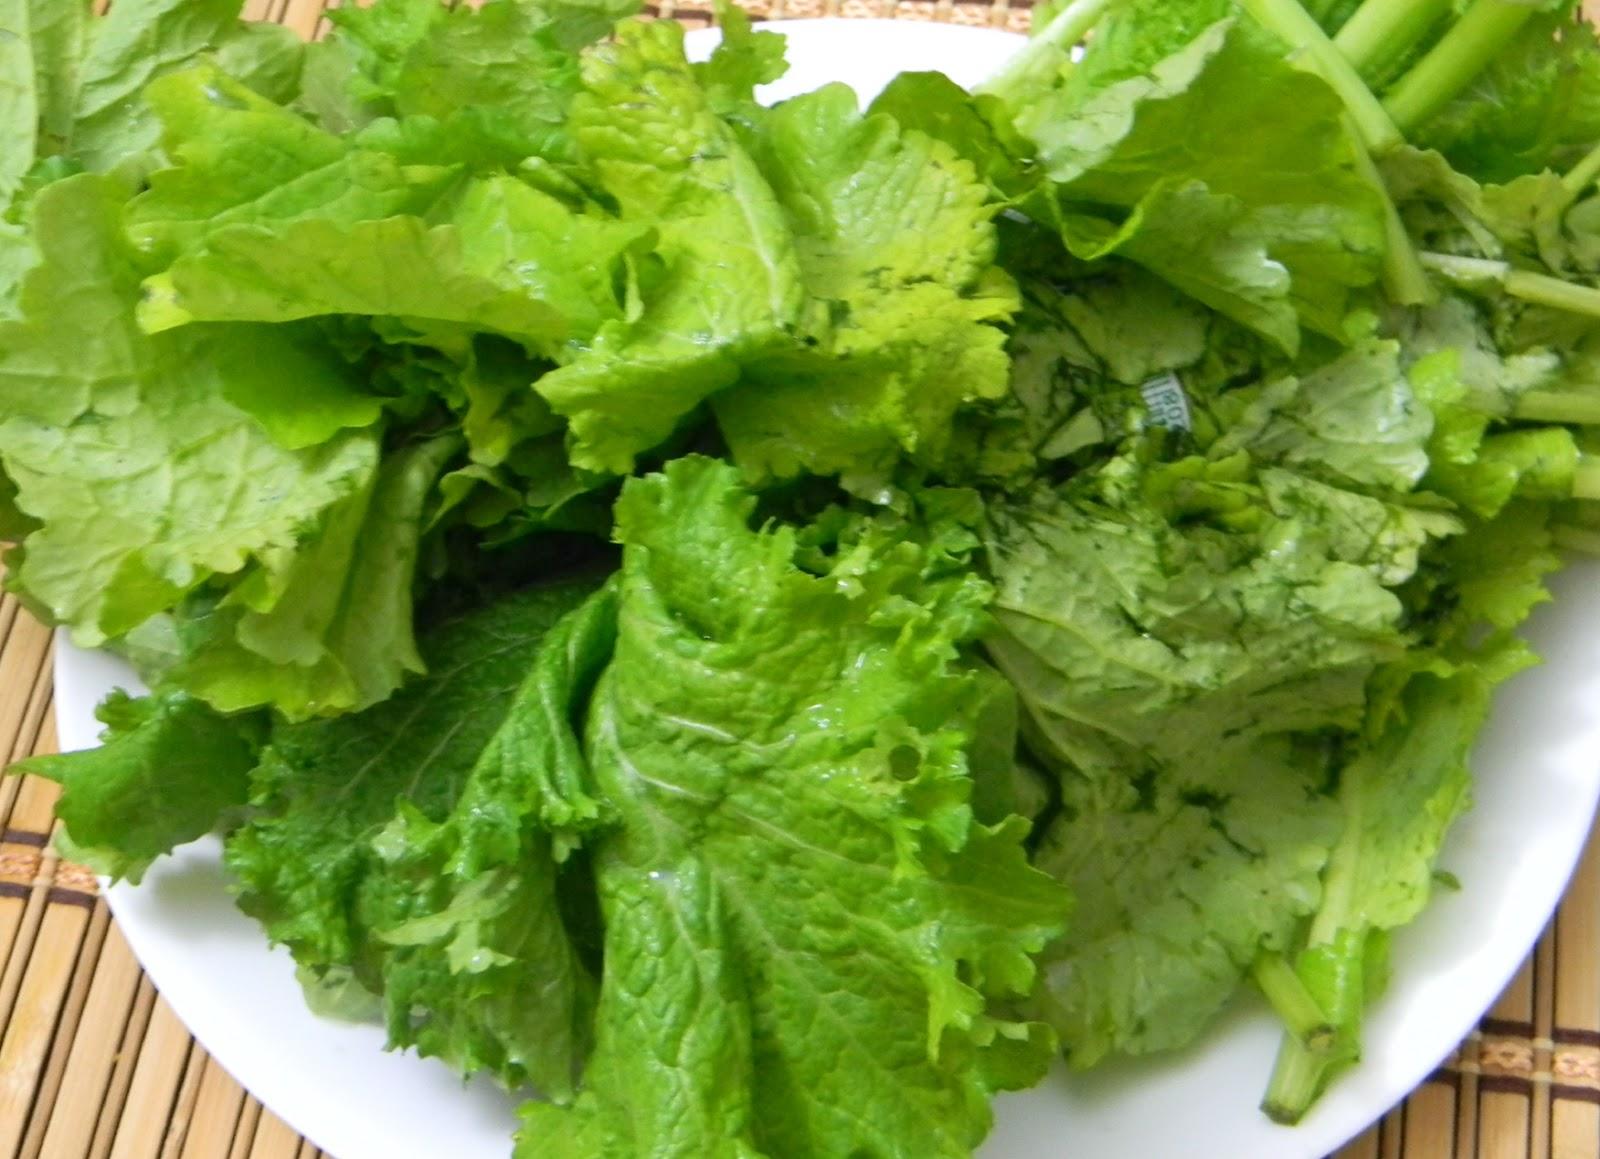 Foody - Buddy: Sarson Ka Saag / Mustard Greens Gravy